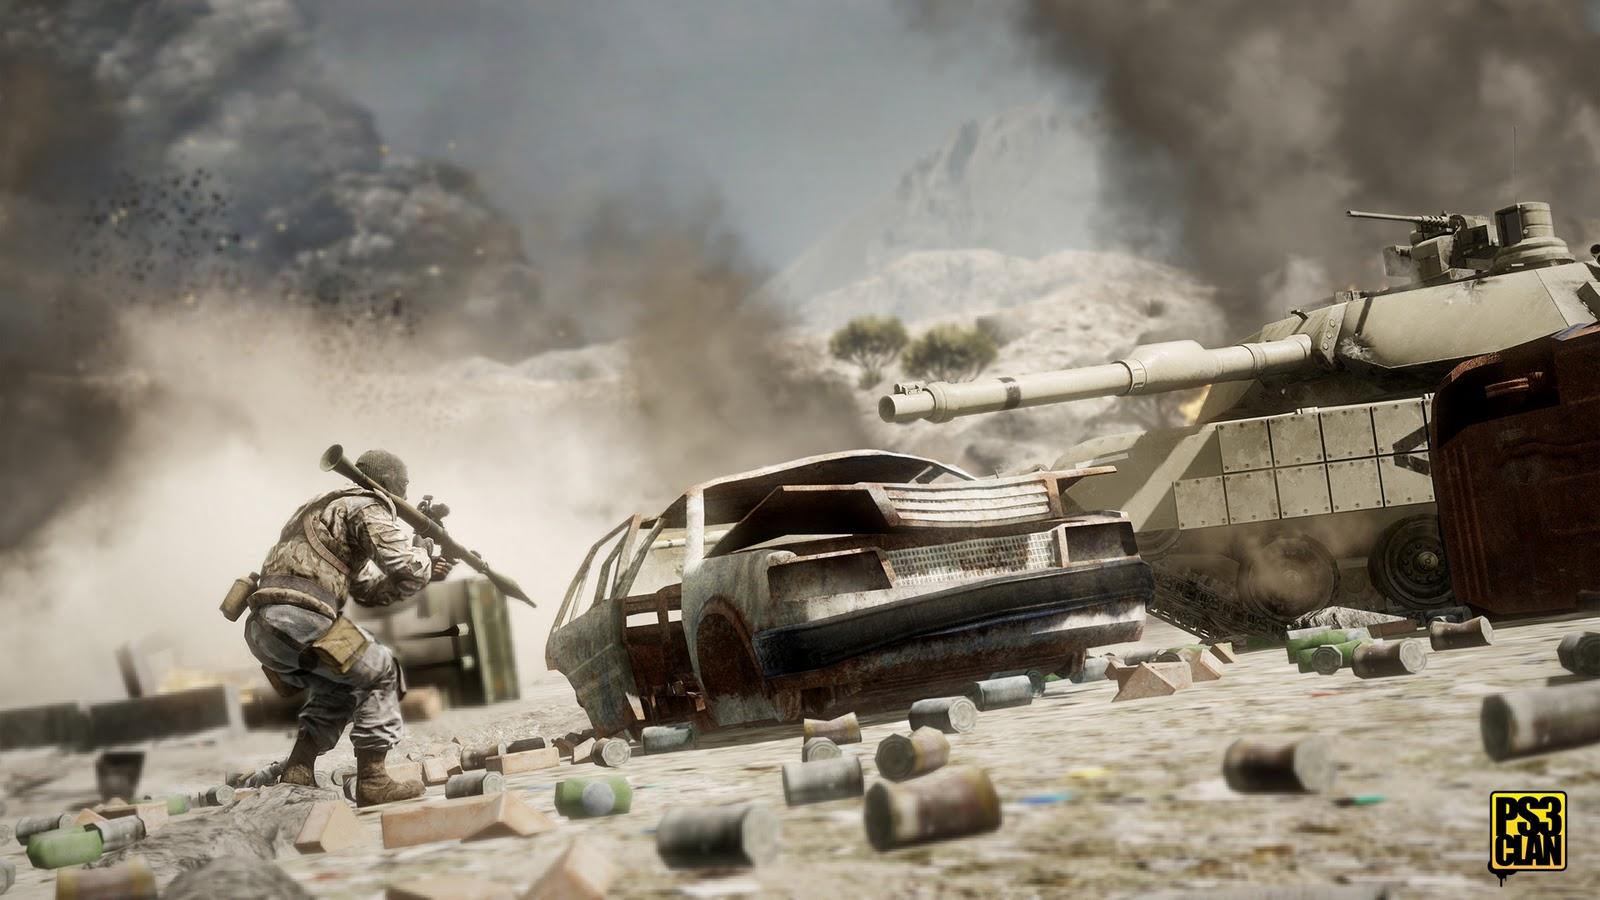 http://1.bp.blogspot.com/-ISYj_d_hSUw/TqPhcg4eCcI/AAAAAAAAIFk/YFwF8J9ymJU/s1600/wallpaper_battlefield_bad_company-2.jpg